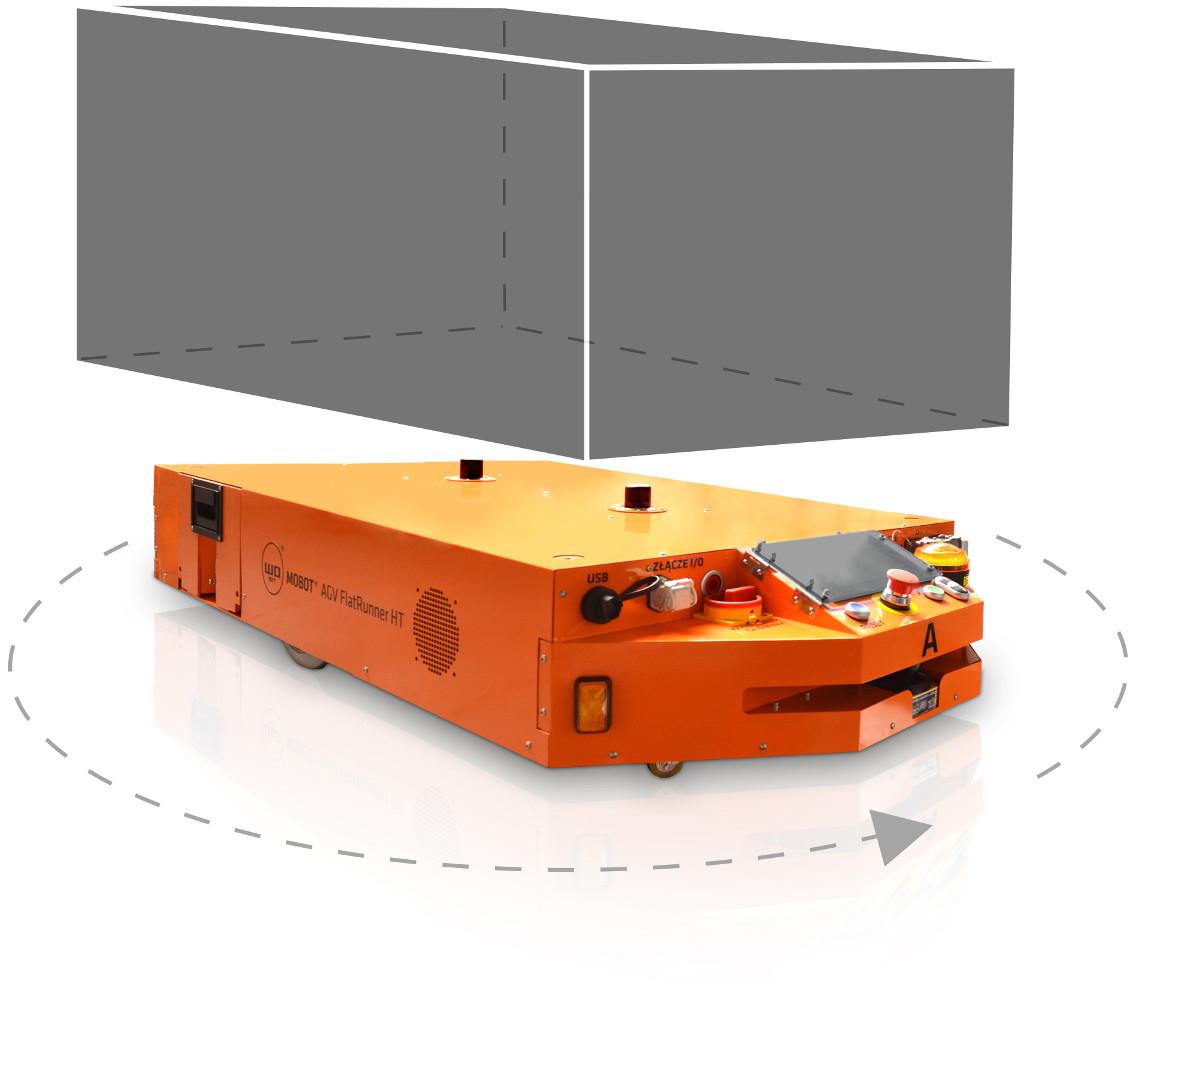 Industrial mobile robot MOBOT® AGV FlatRunner HT